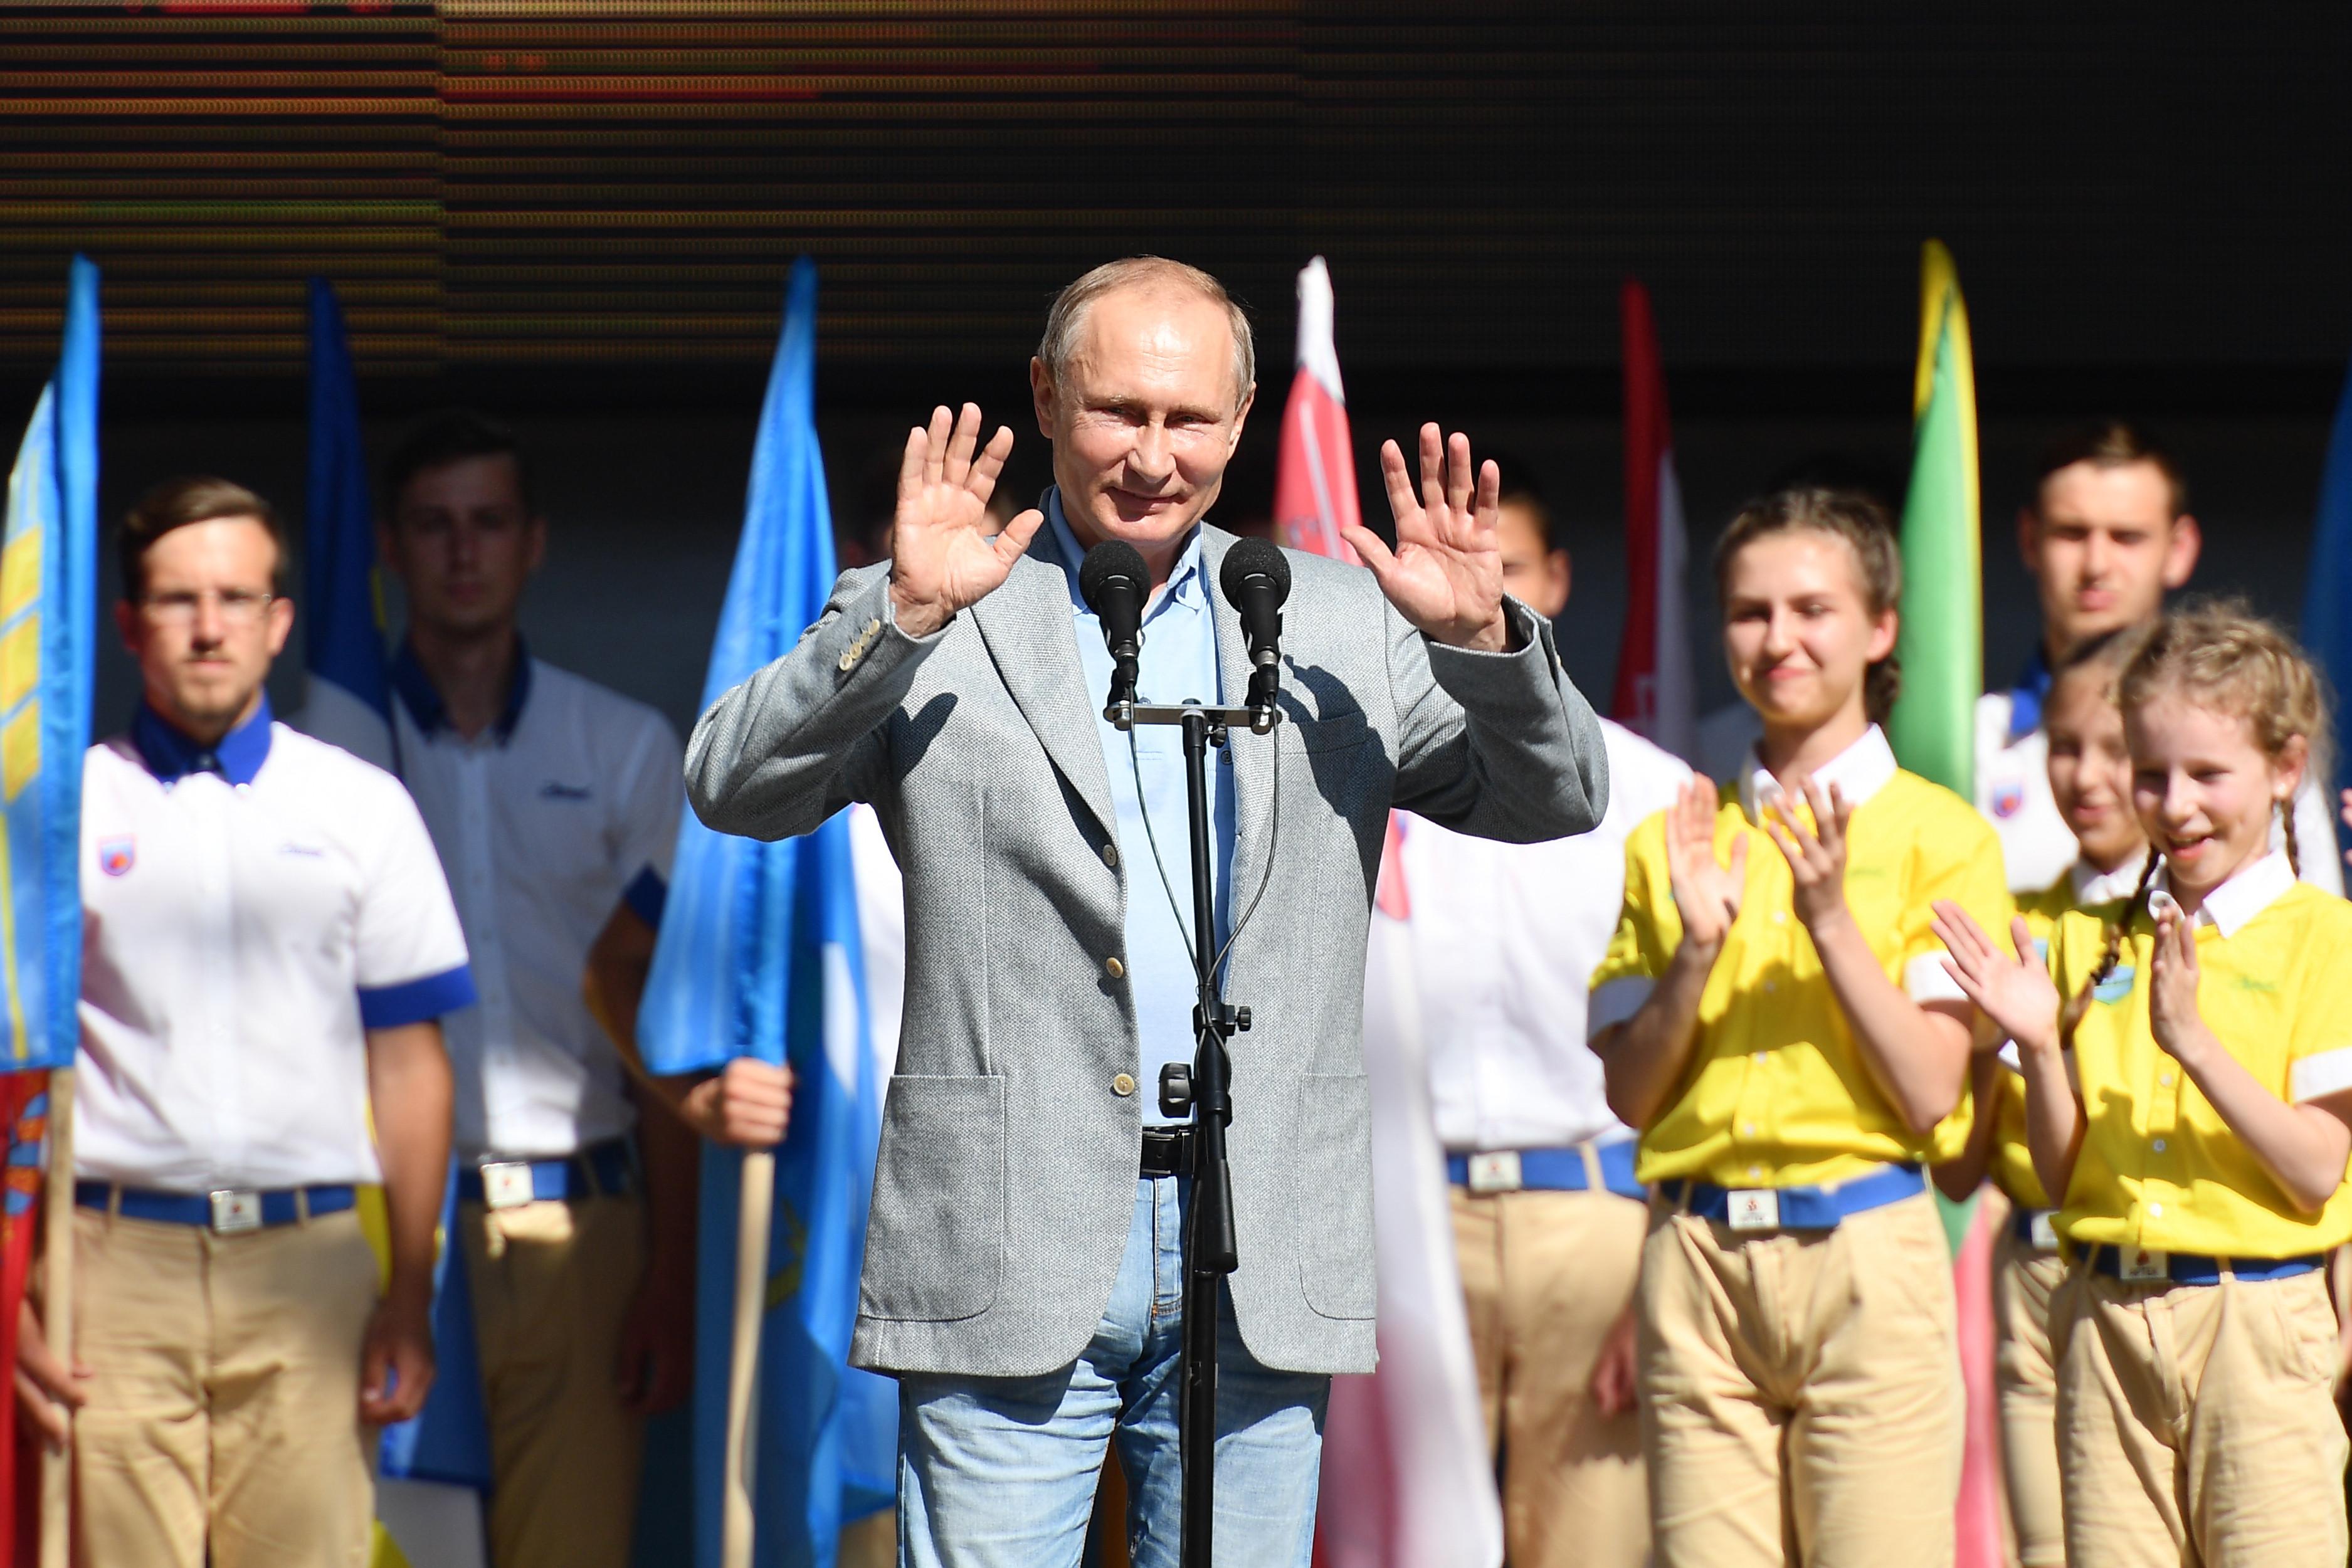 <p><span>Президент РФ Владимир Путин. Фото &copy; РИА Новости/Рамиль Ситдиков</span></p>